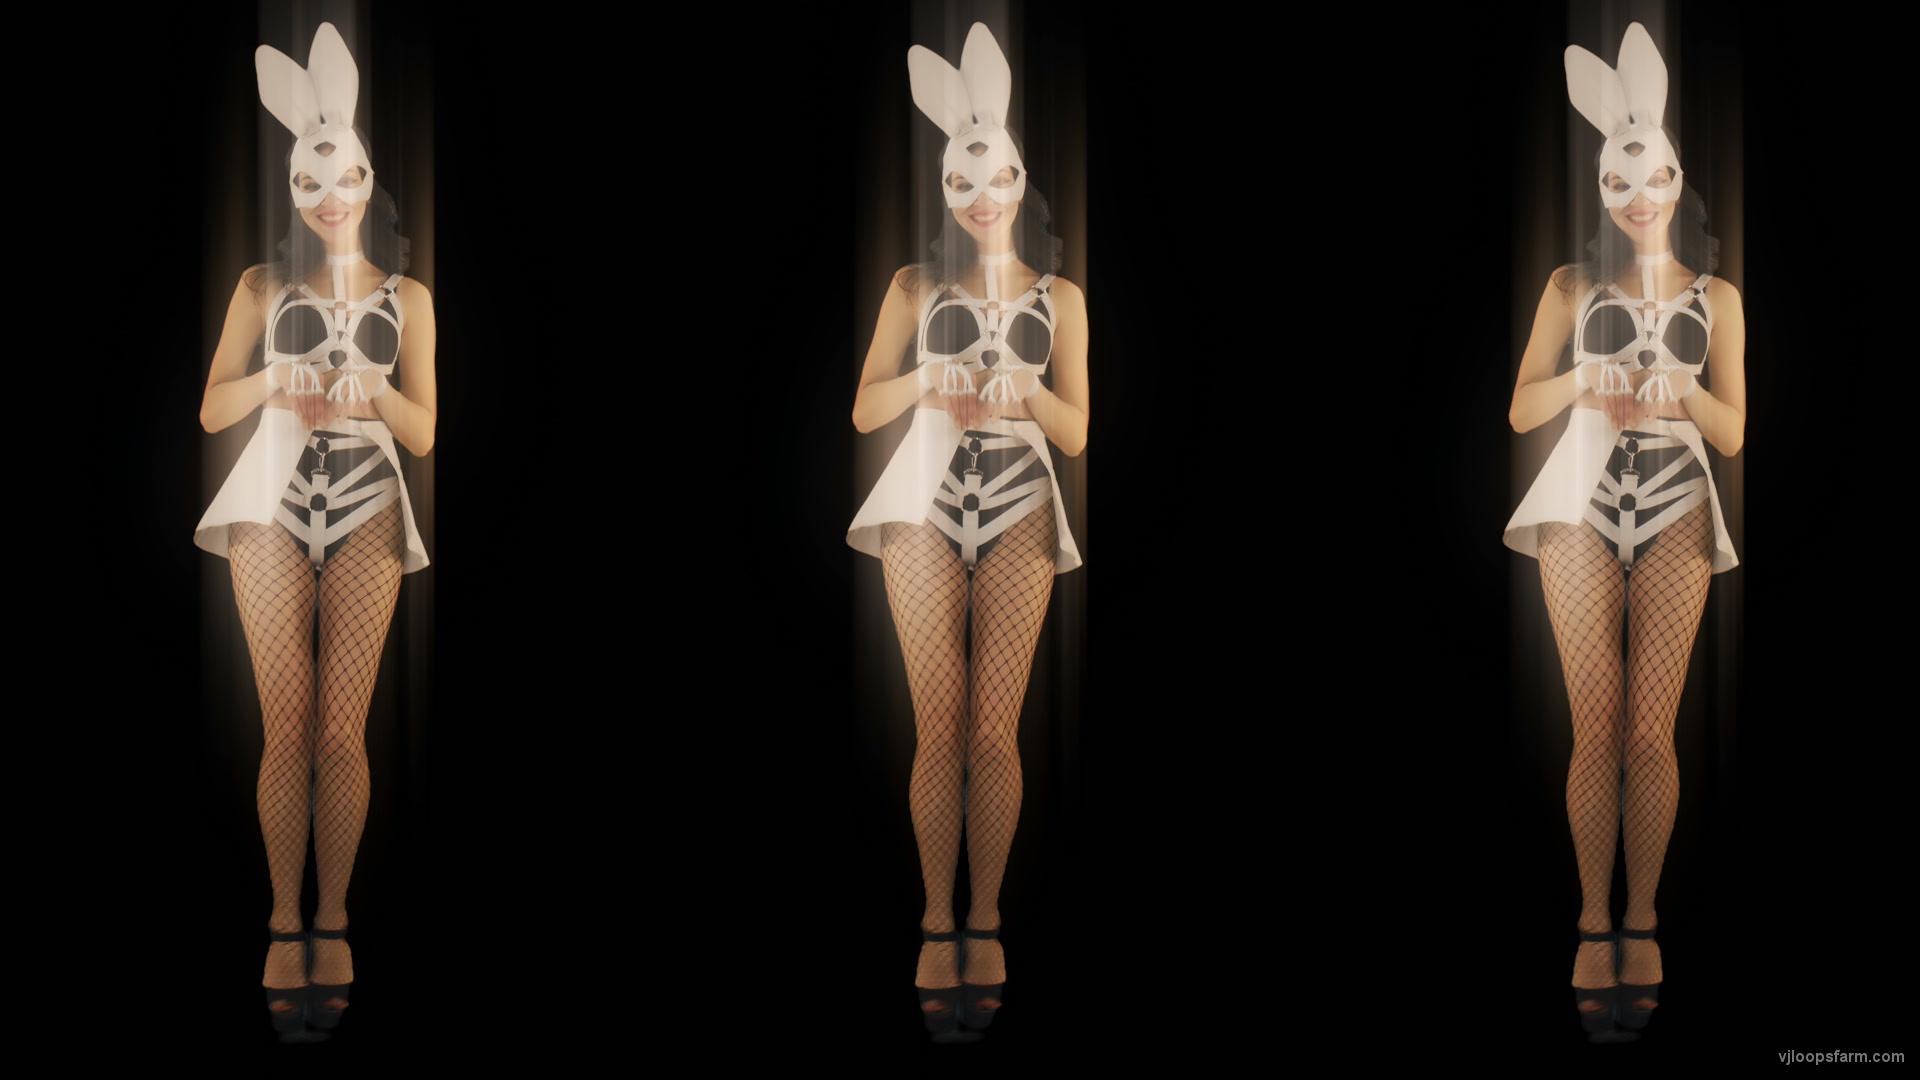 vj video background Trio-Team-Girl-Bunny-Go-Go-Jump-Video-Art-4K-VJ-loop_003